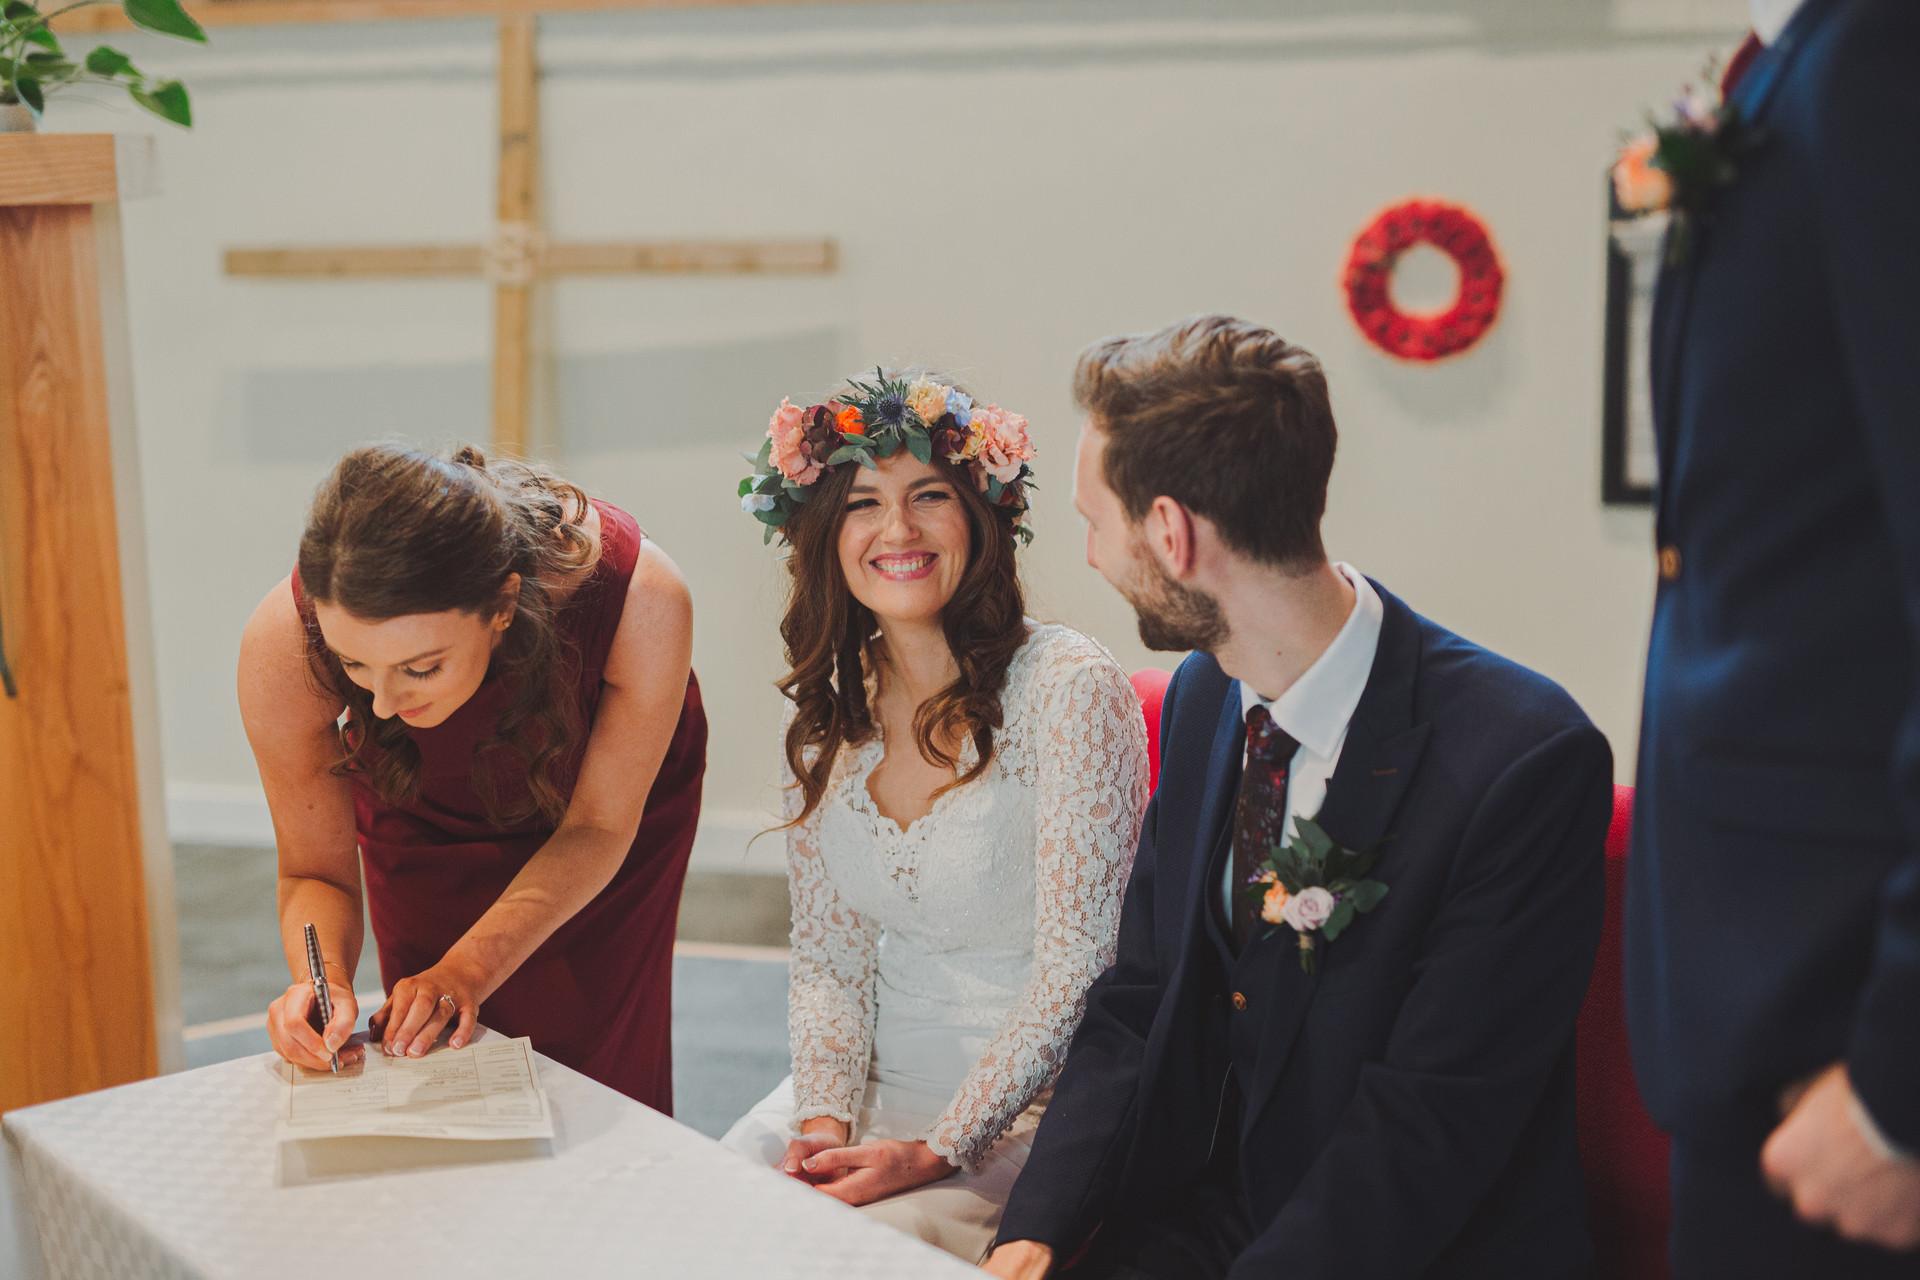 Willowfield Church Belfast Wedding | Boho Bride | Quirky Wedding | Living Witness Weddings